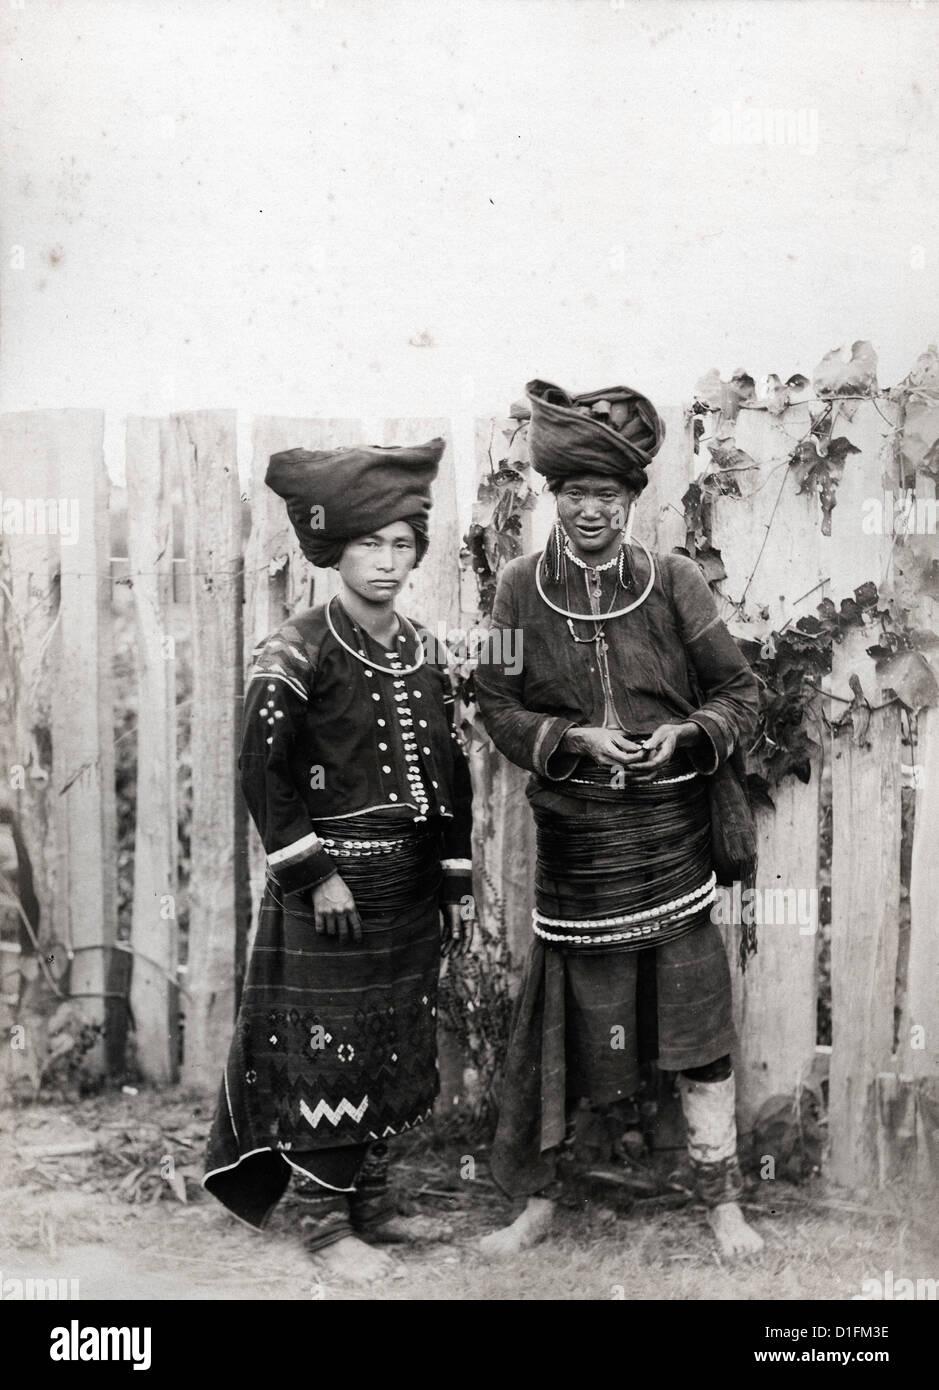 Les femmes de Kachin, Birmanie, ca 1889, par Felice Beato Photo Stock